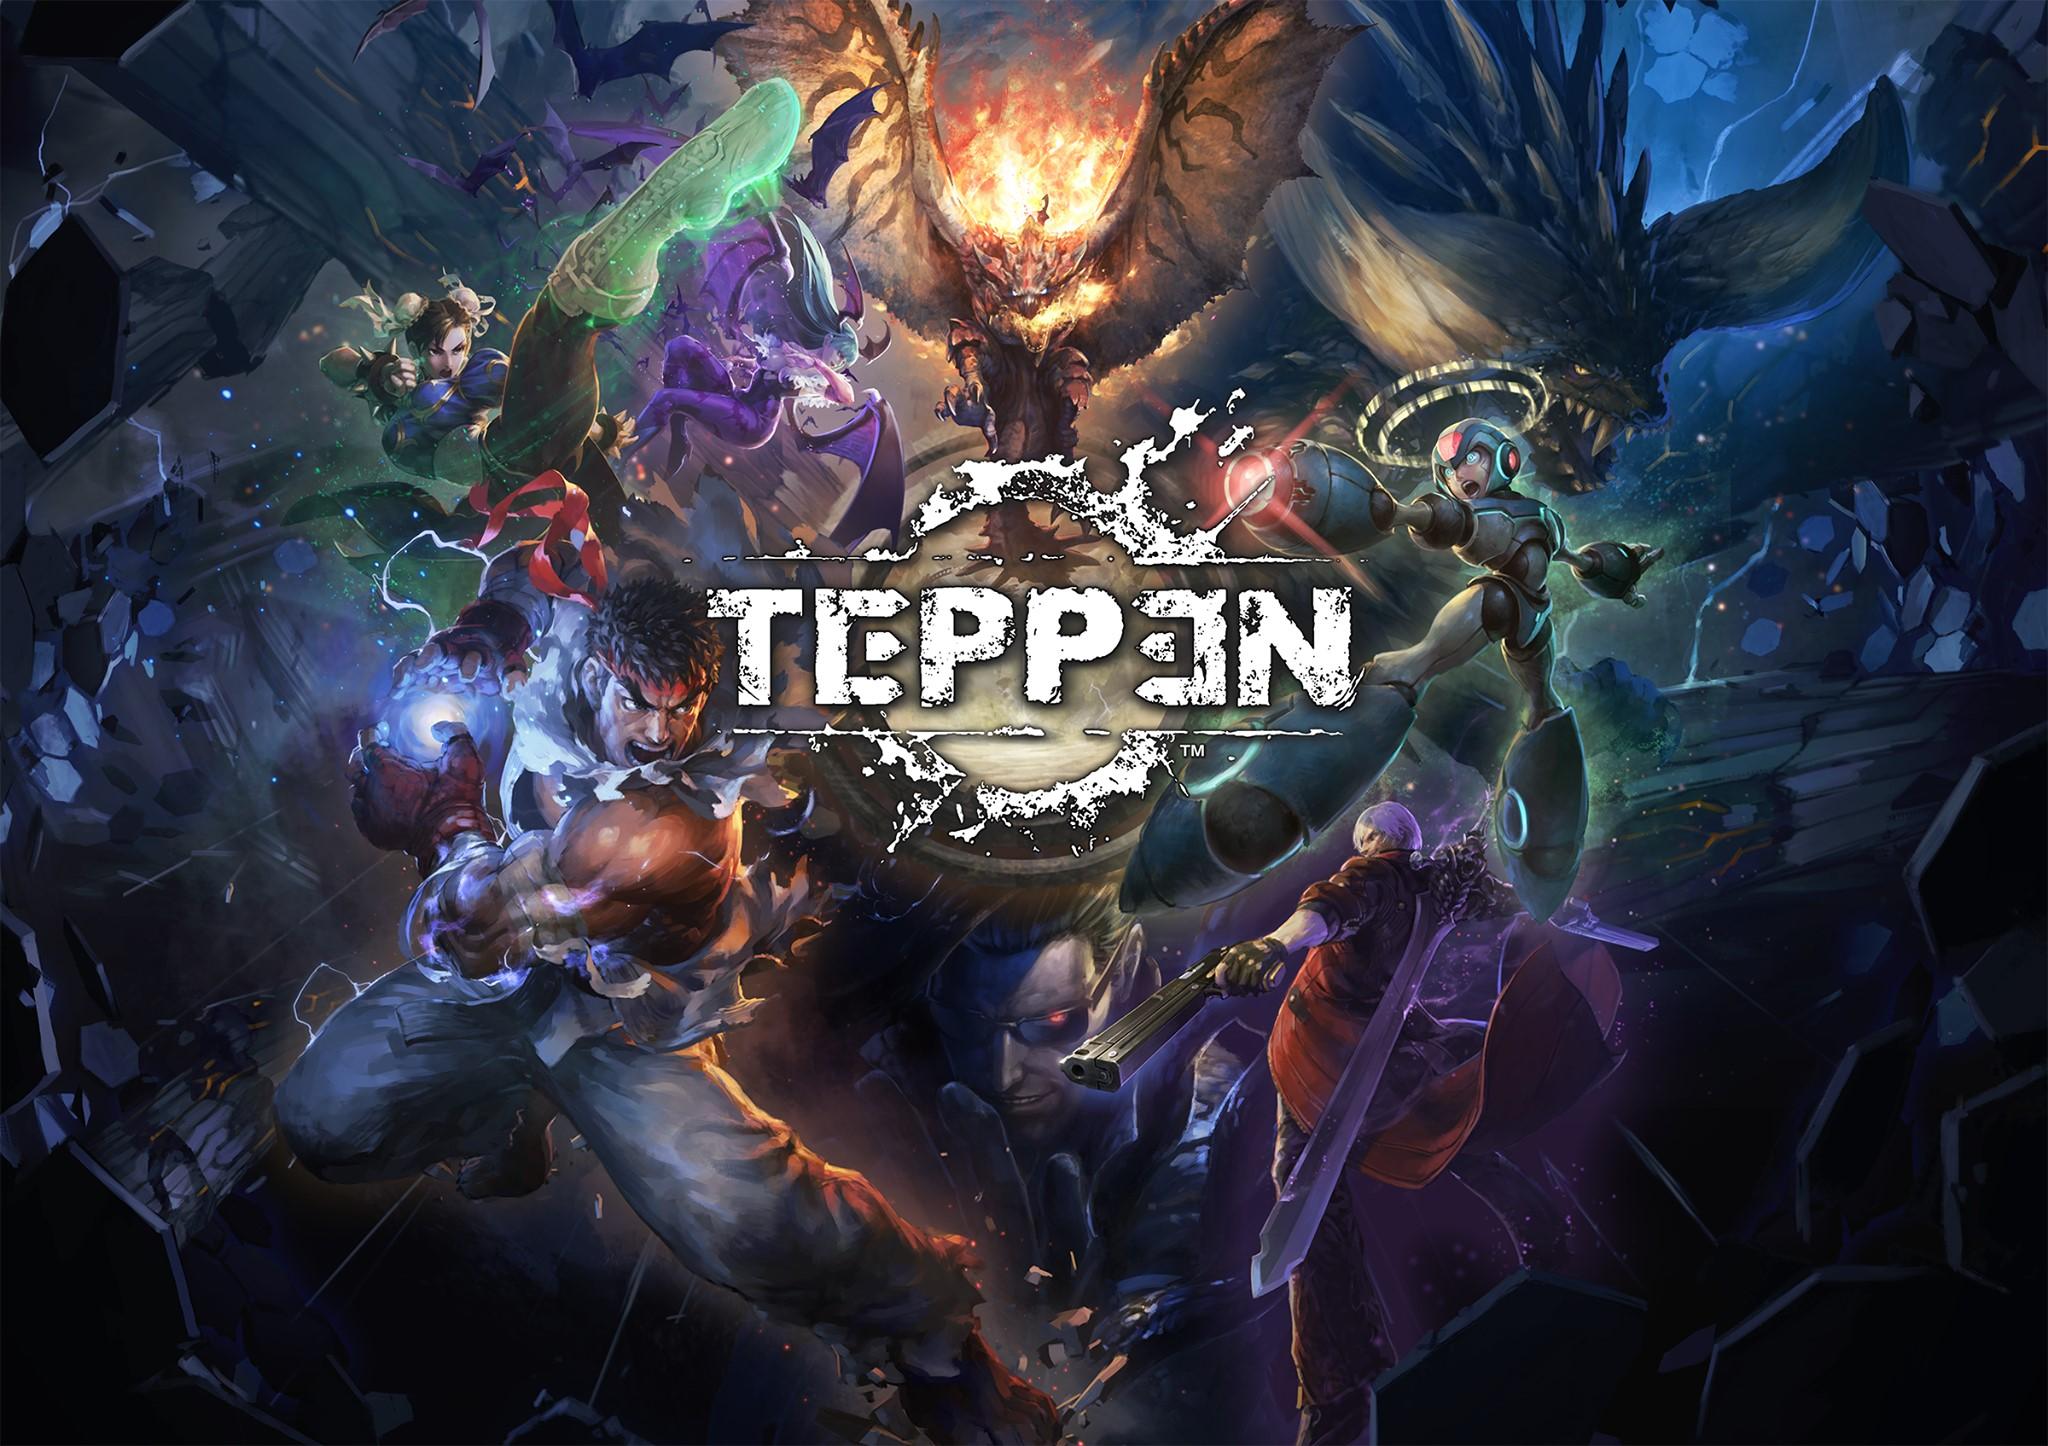 Teppen : ce jeu mobile réunit Street Fighter, Monster Hunter, Resident Evil et bien plus